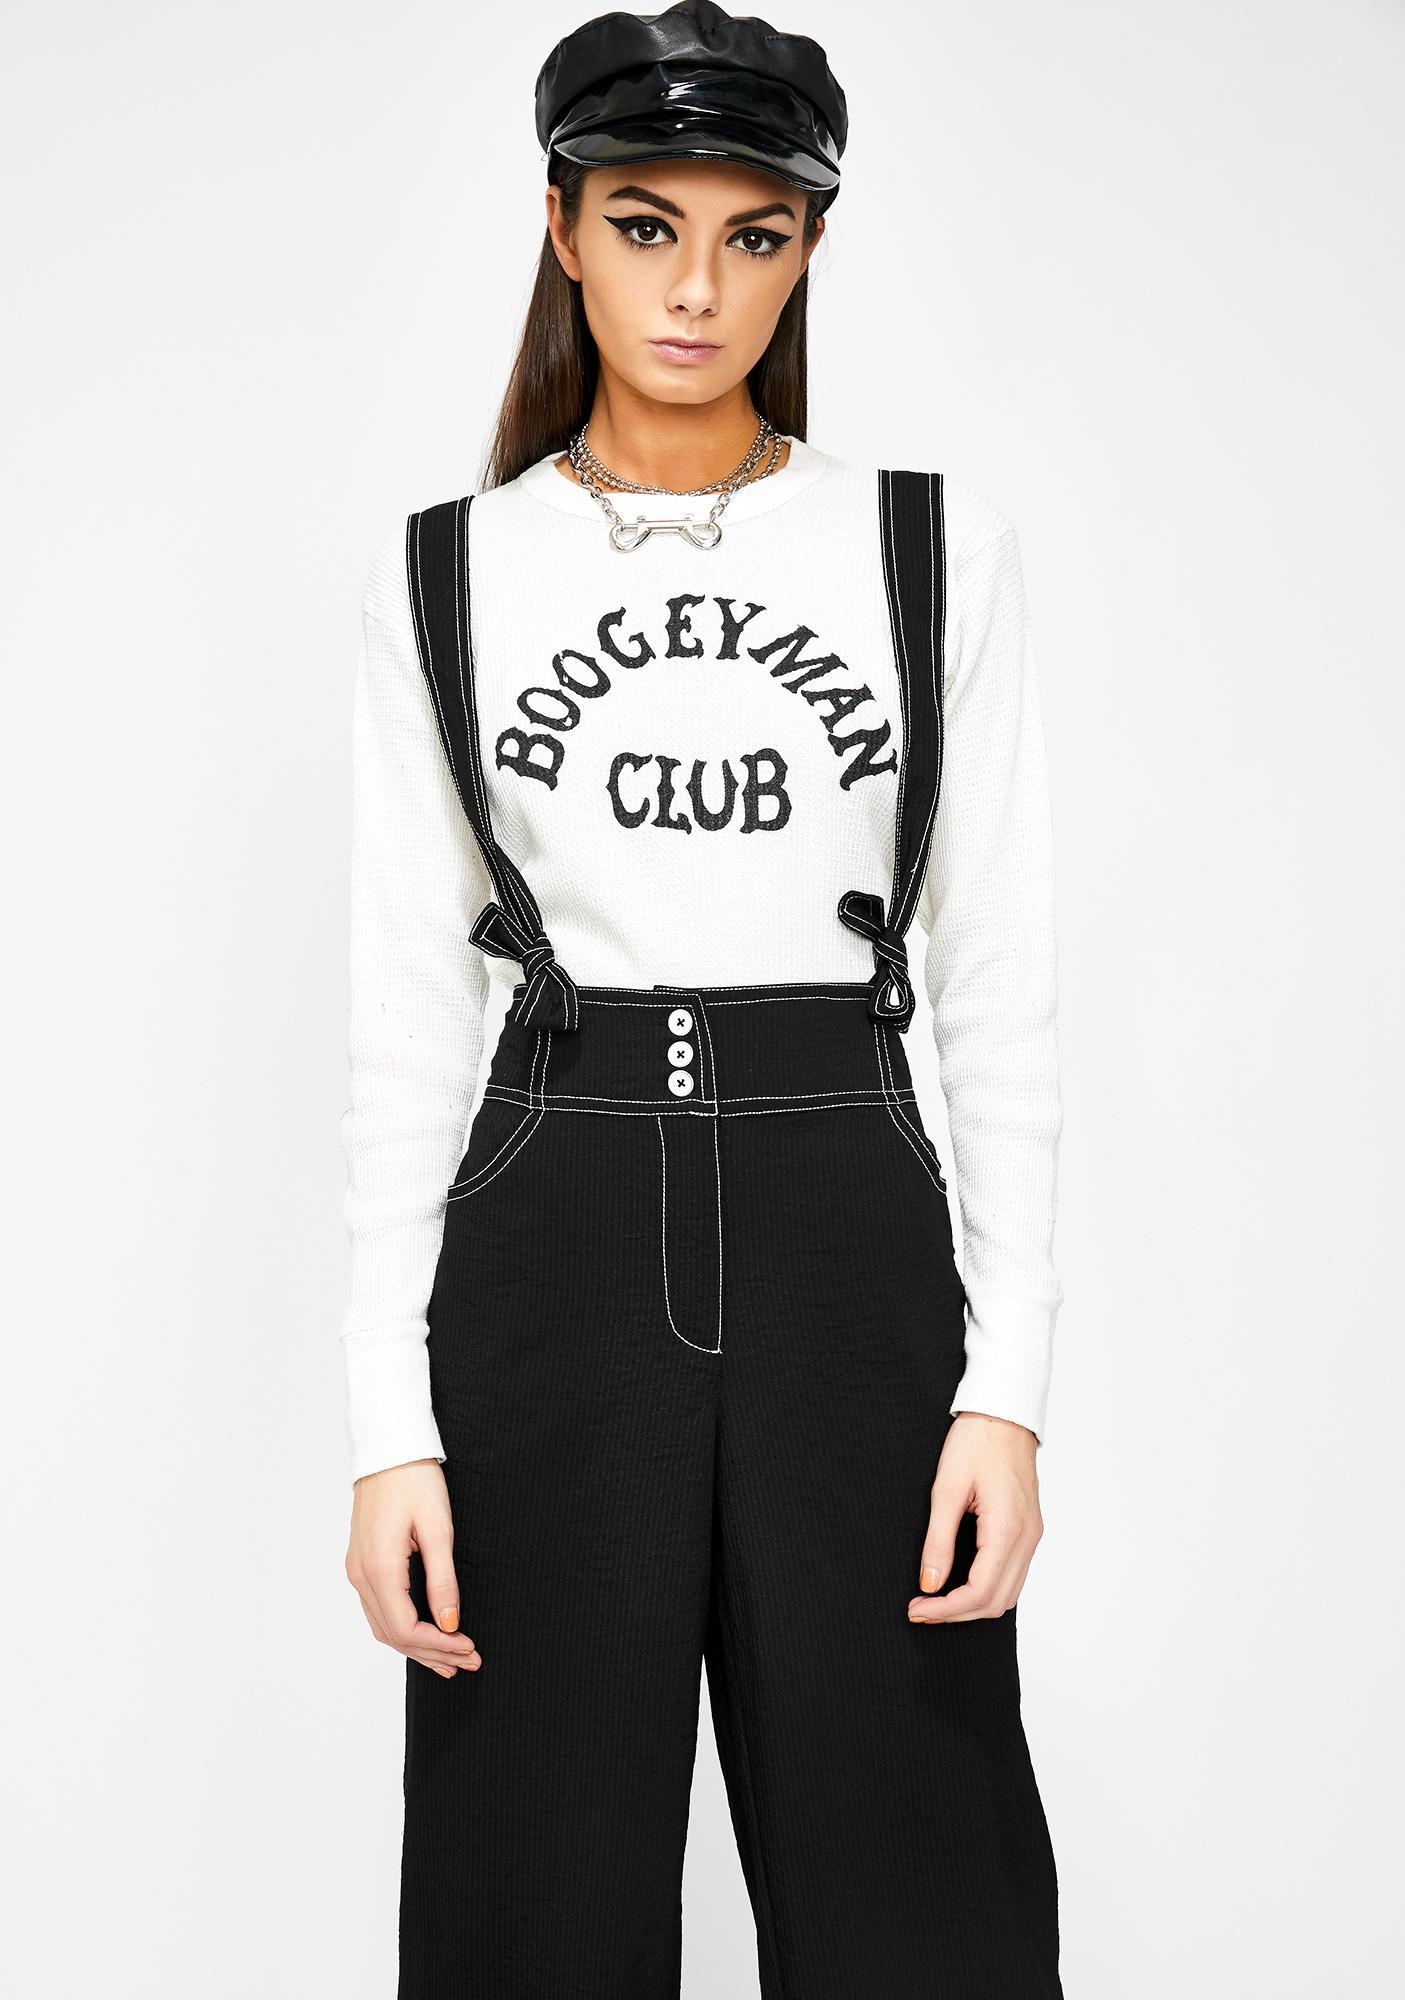 8c0a524e4c7 Get Some Suspender Pants  Get Some Suspender Pants ...